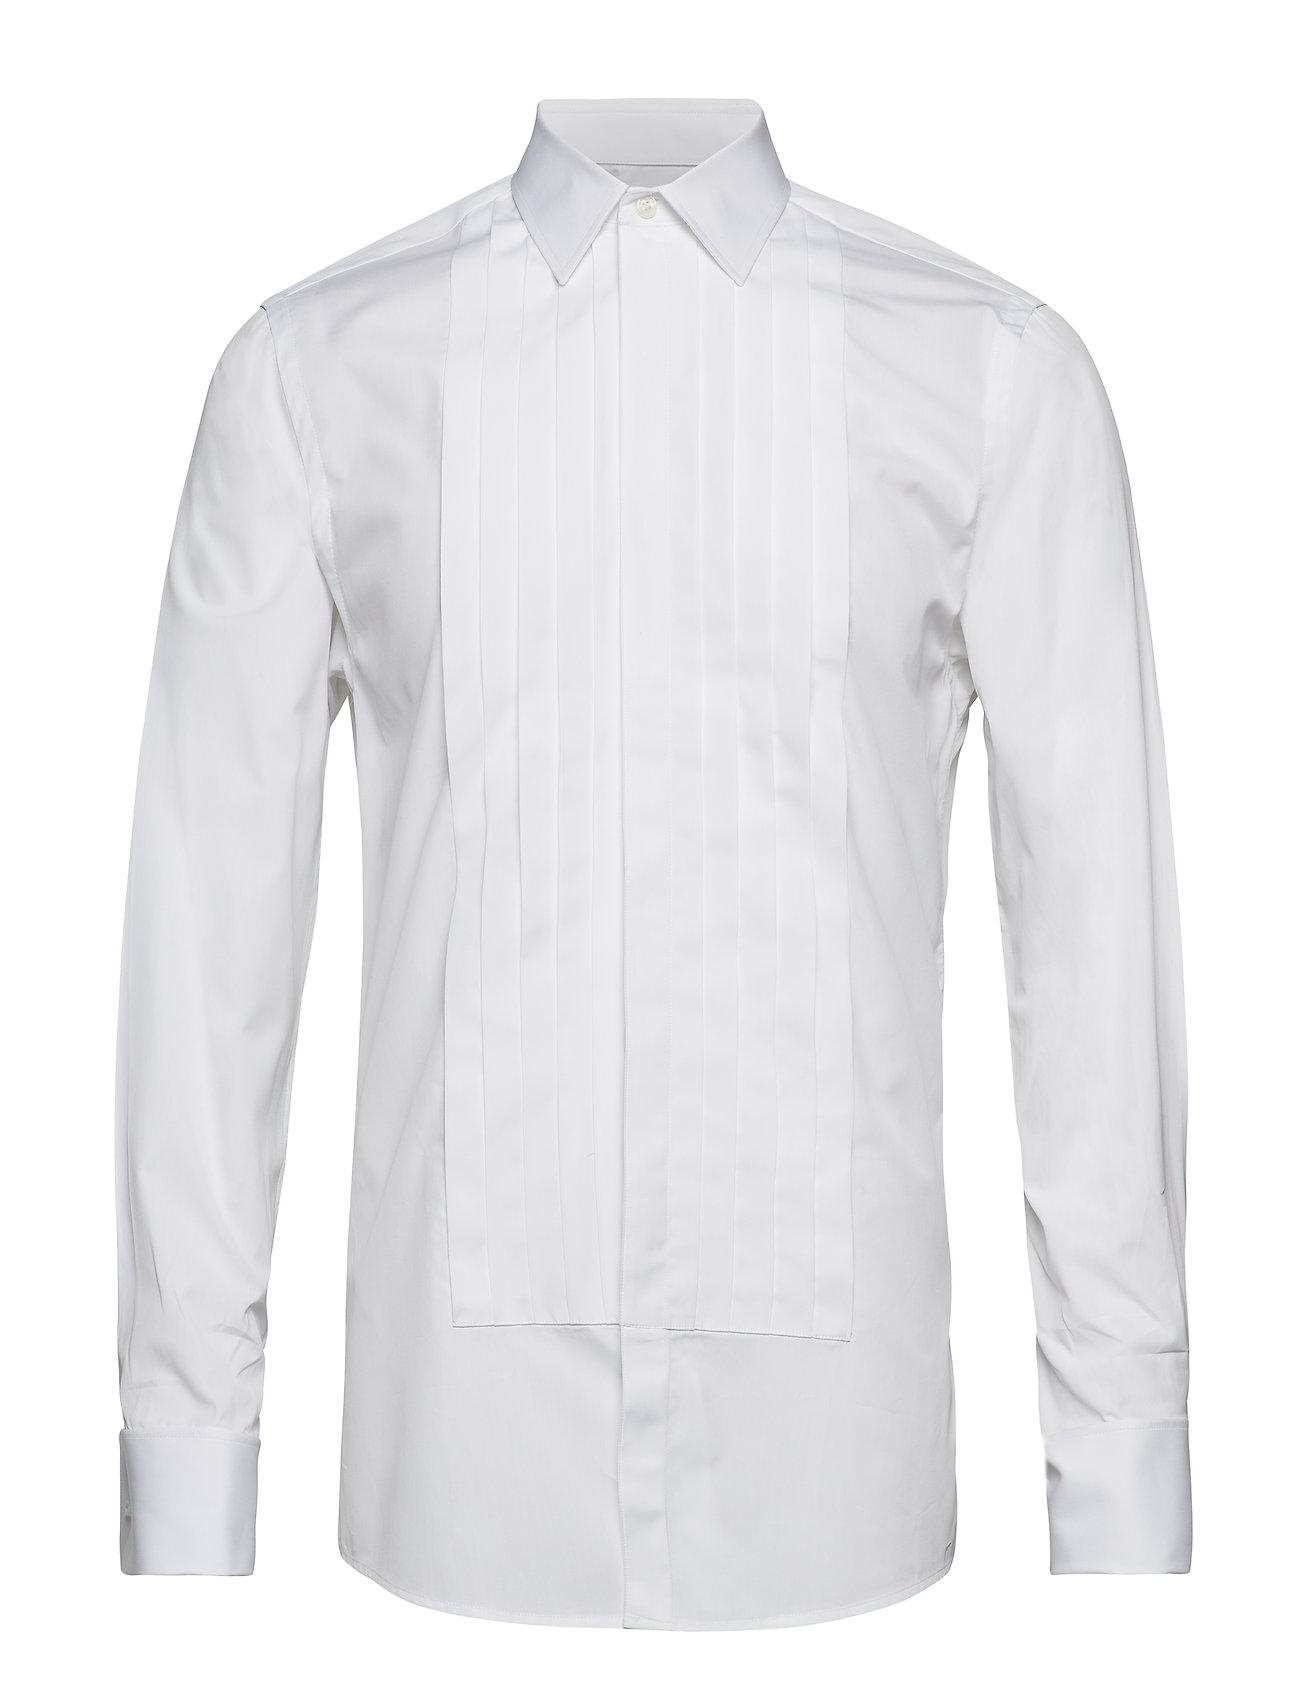 TIGER OF SWEDEN Fulton Anzughemd Hemd Weiß TIGER OF SWEDEN